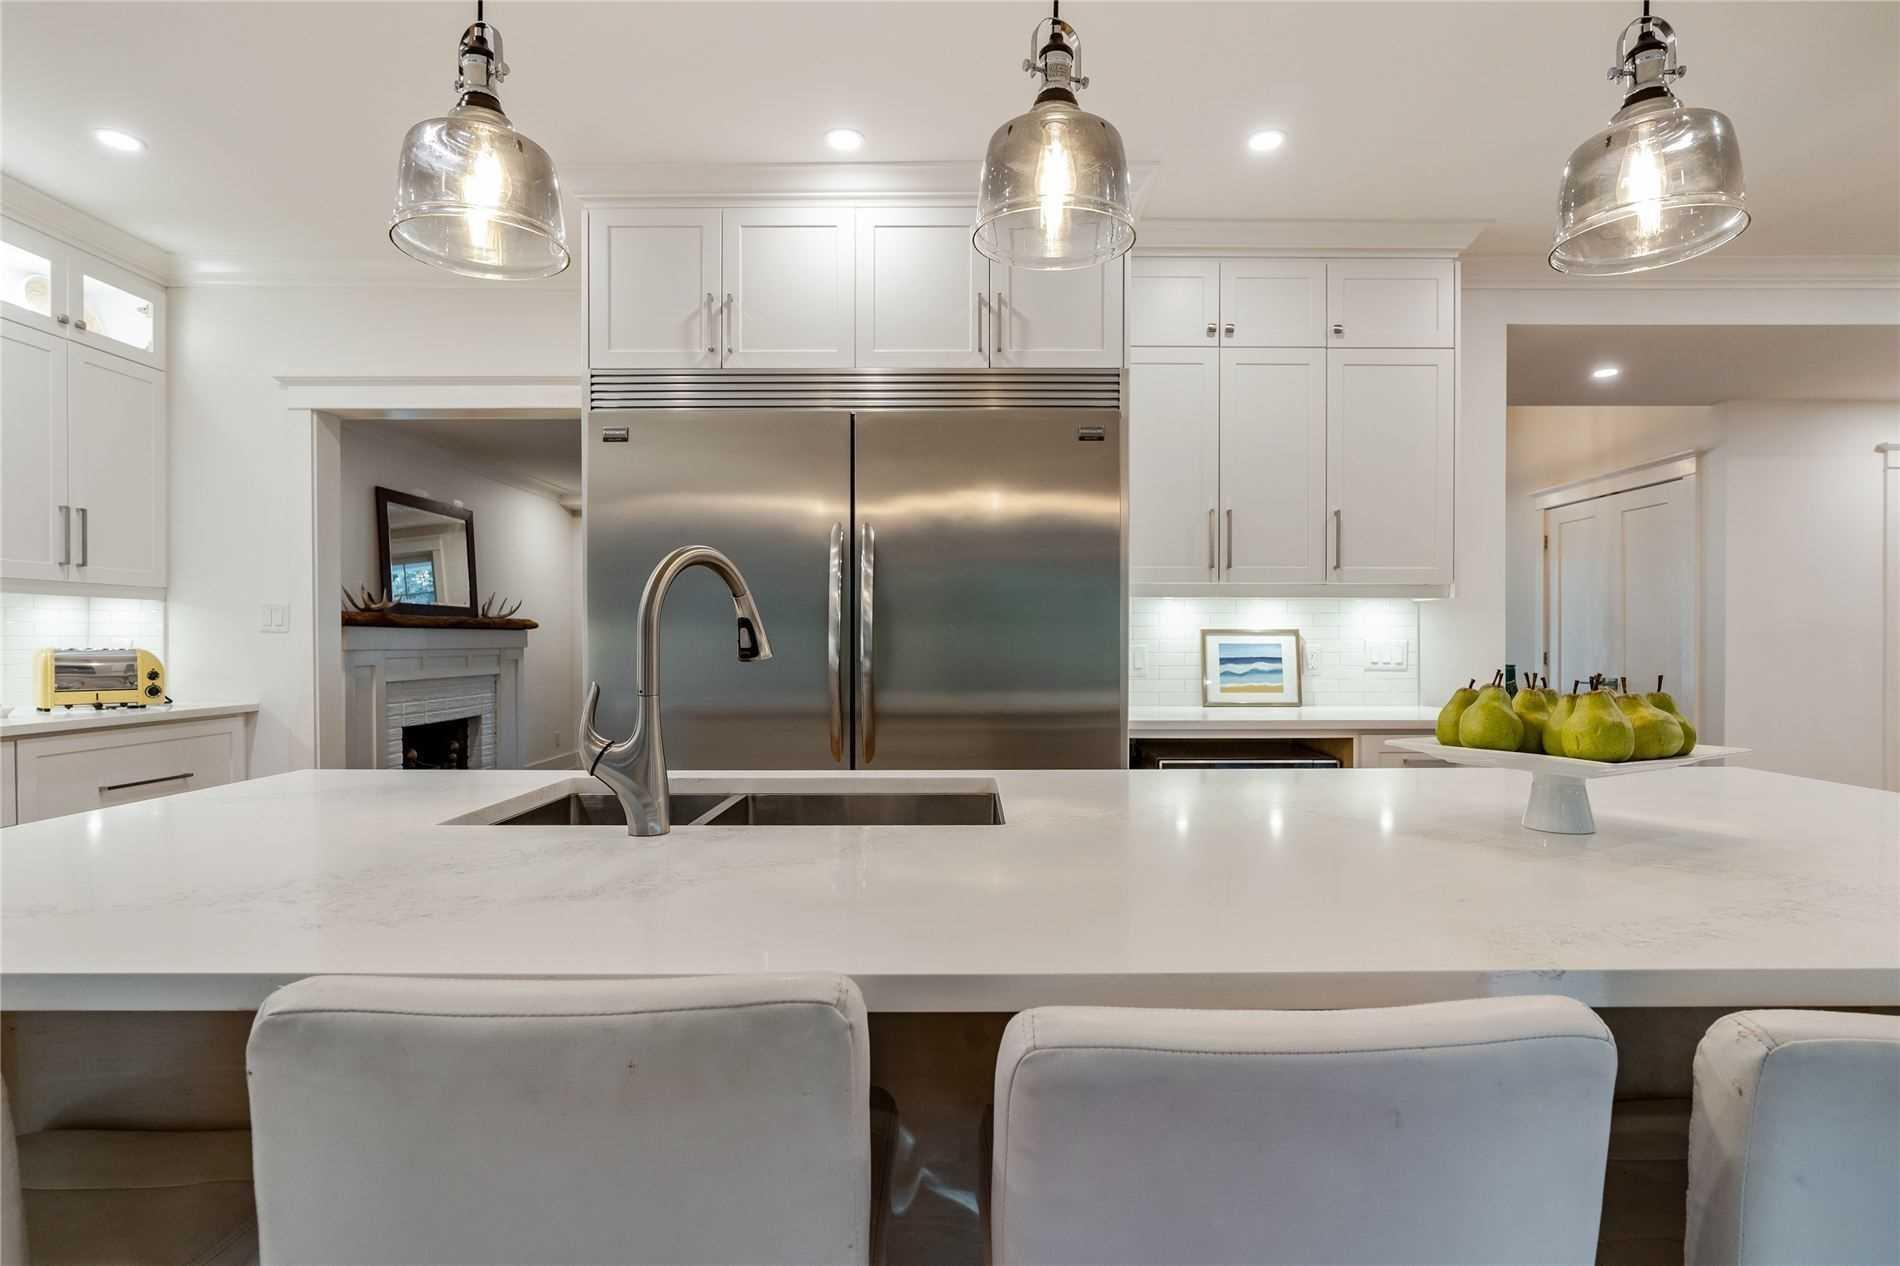 234 Linwood Cres, Burlington, Ontario L7L4A1, 4 Bedrooms Bedrooms, 10 Rooms Rooms,3 BathroomsBathrooms,Detached,For Sale,Linwood,W5395461